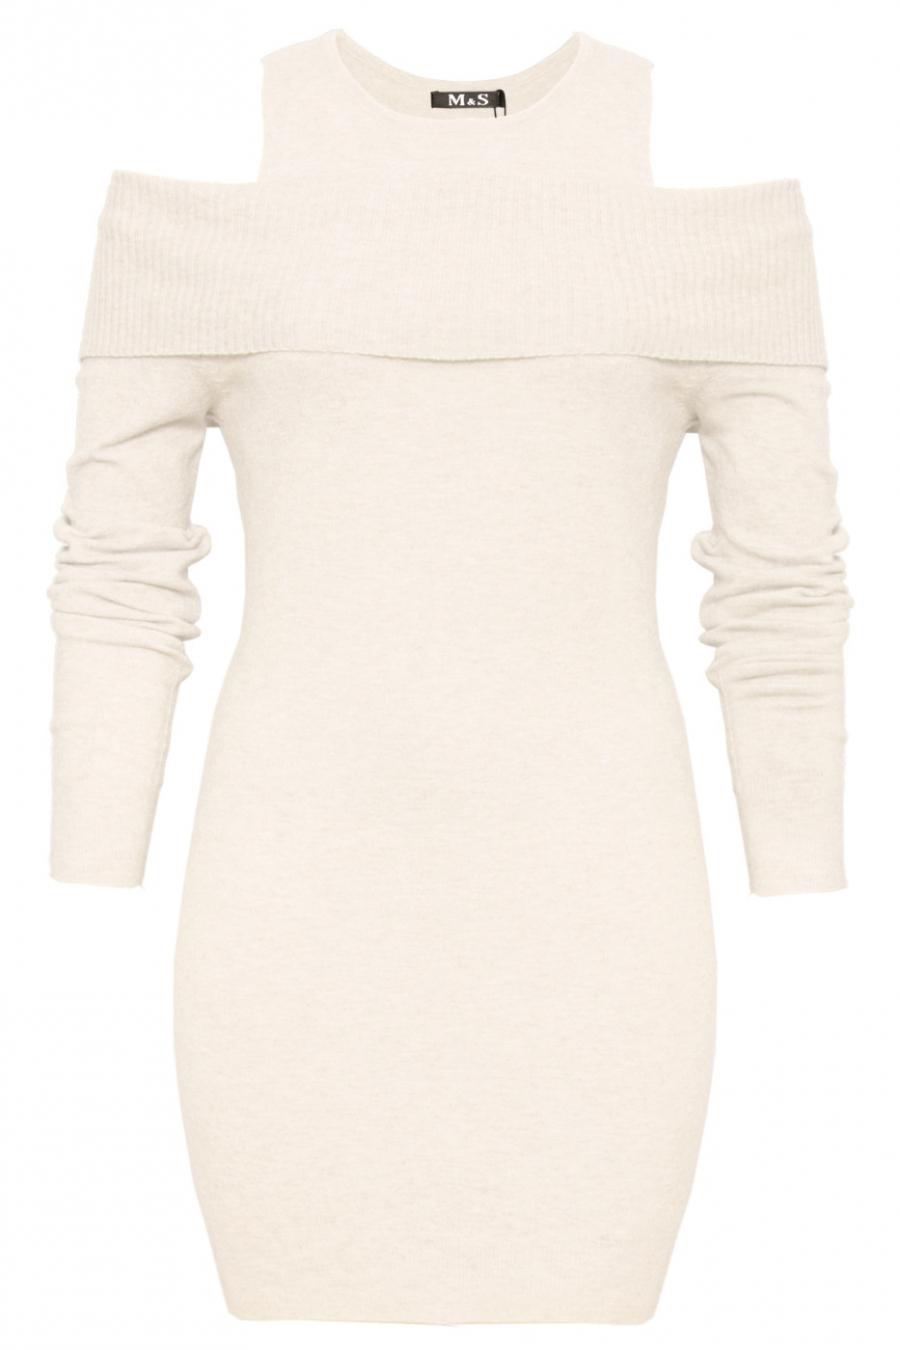 Mooie witte tuniek open schouder. Trendy kleding 1969